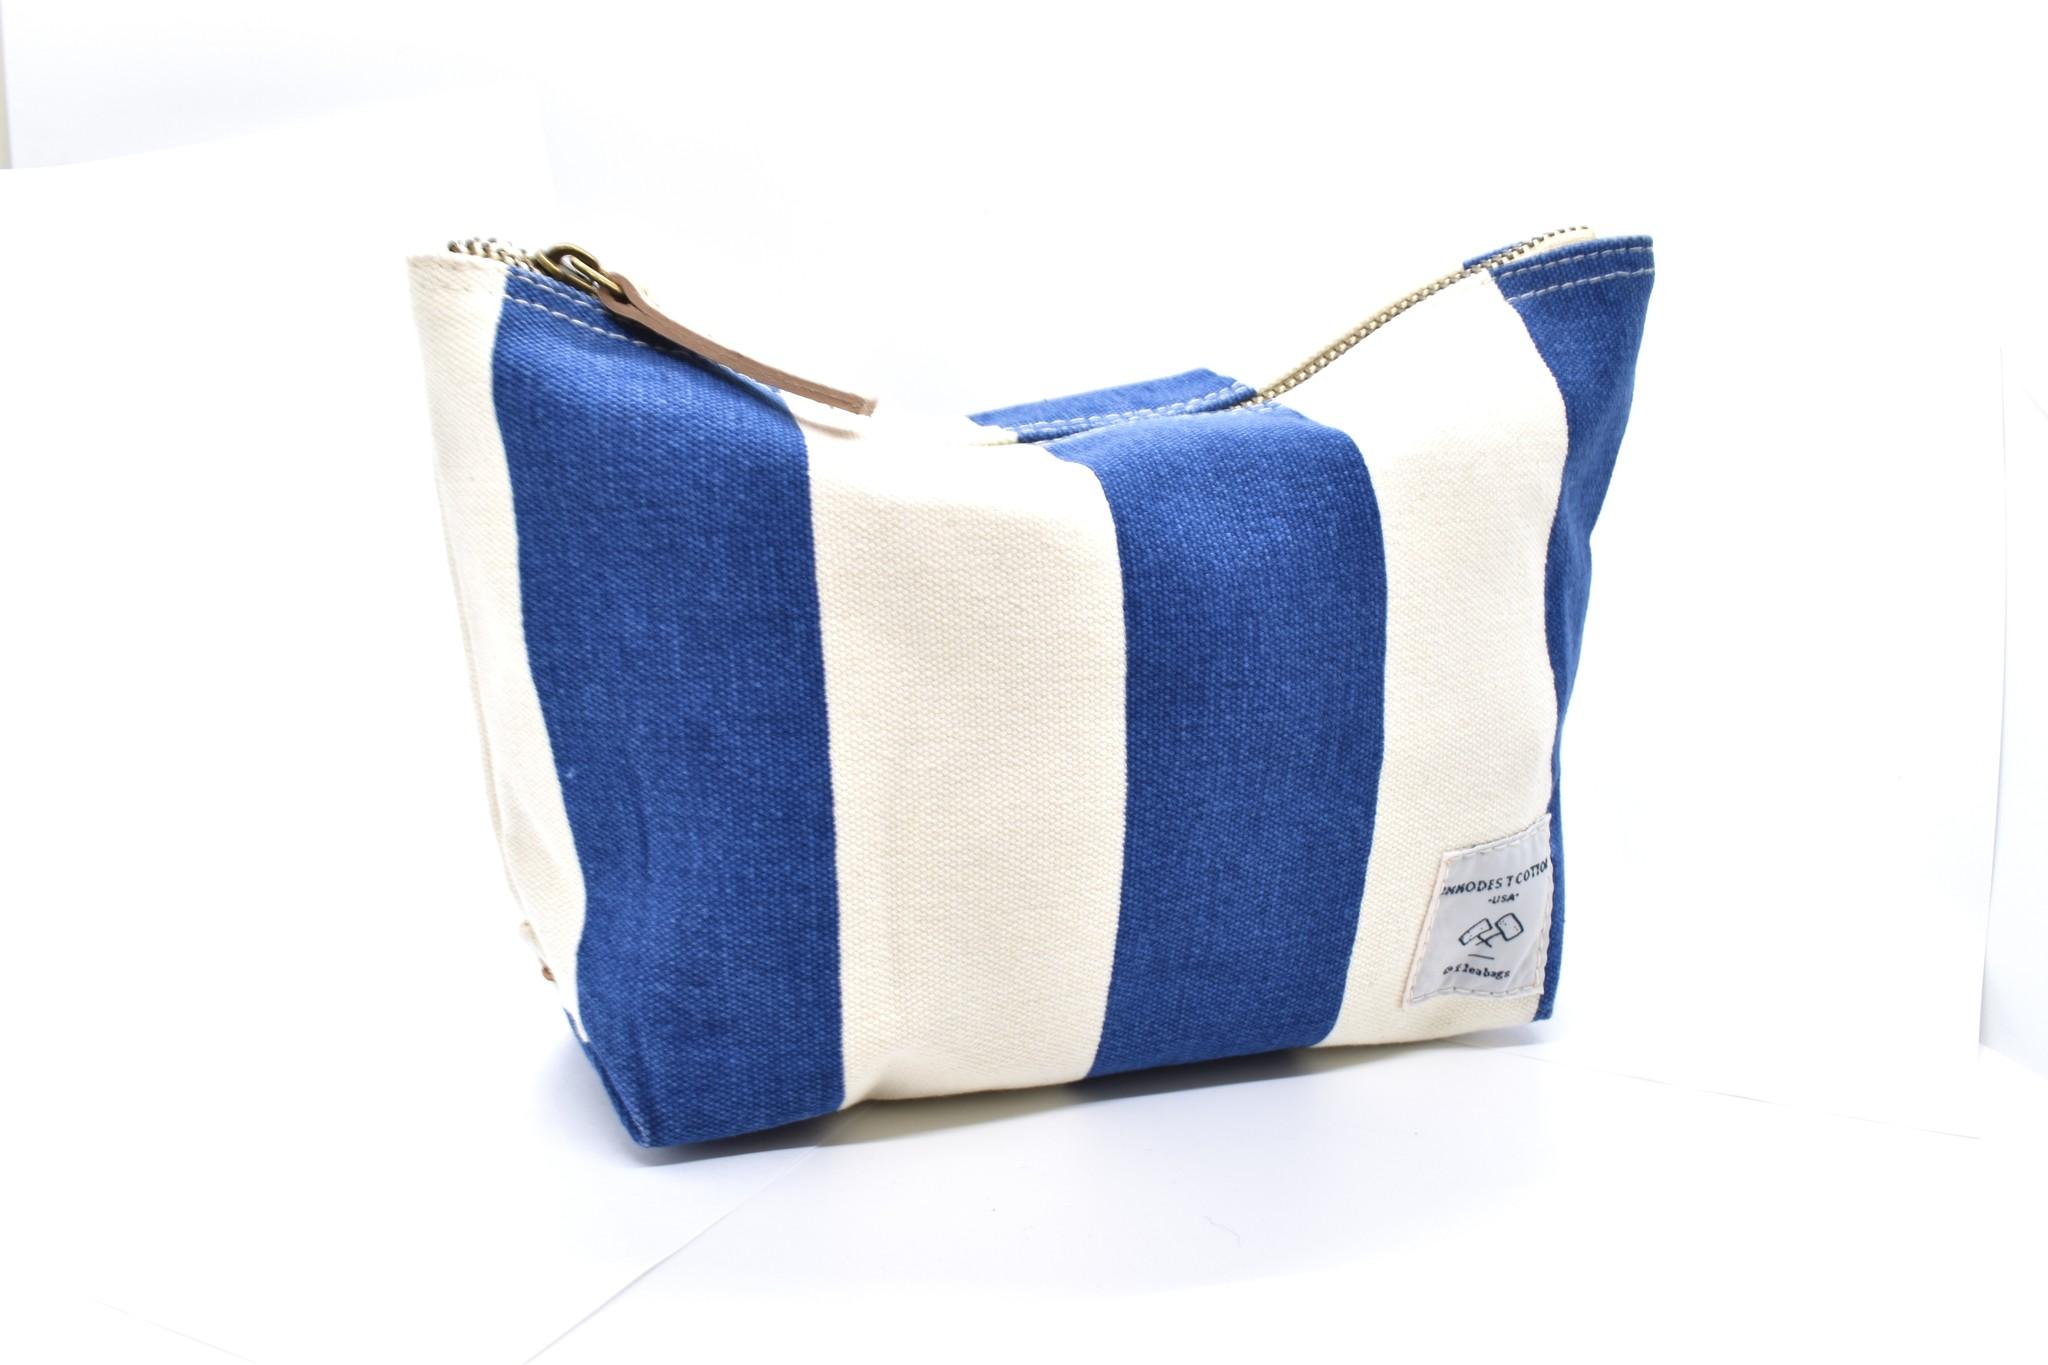 IMMODEST COTTON x Fleabags Sardine Pouch, Blue & White Stripe